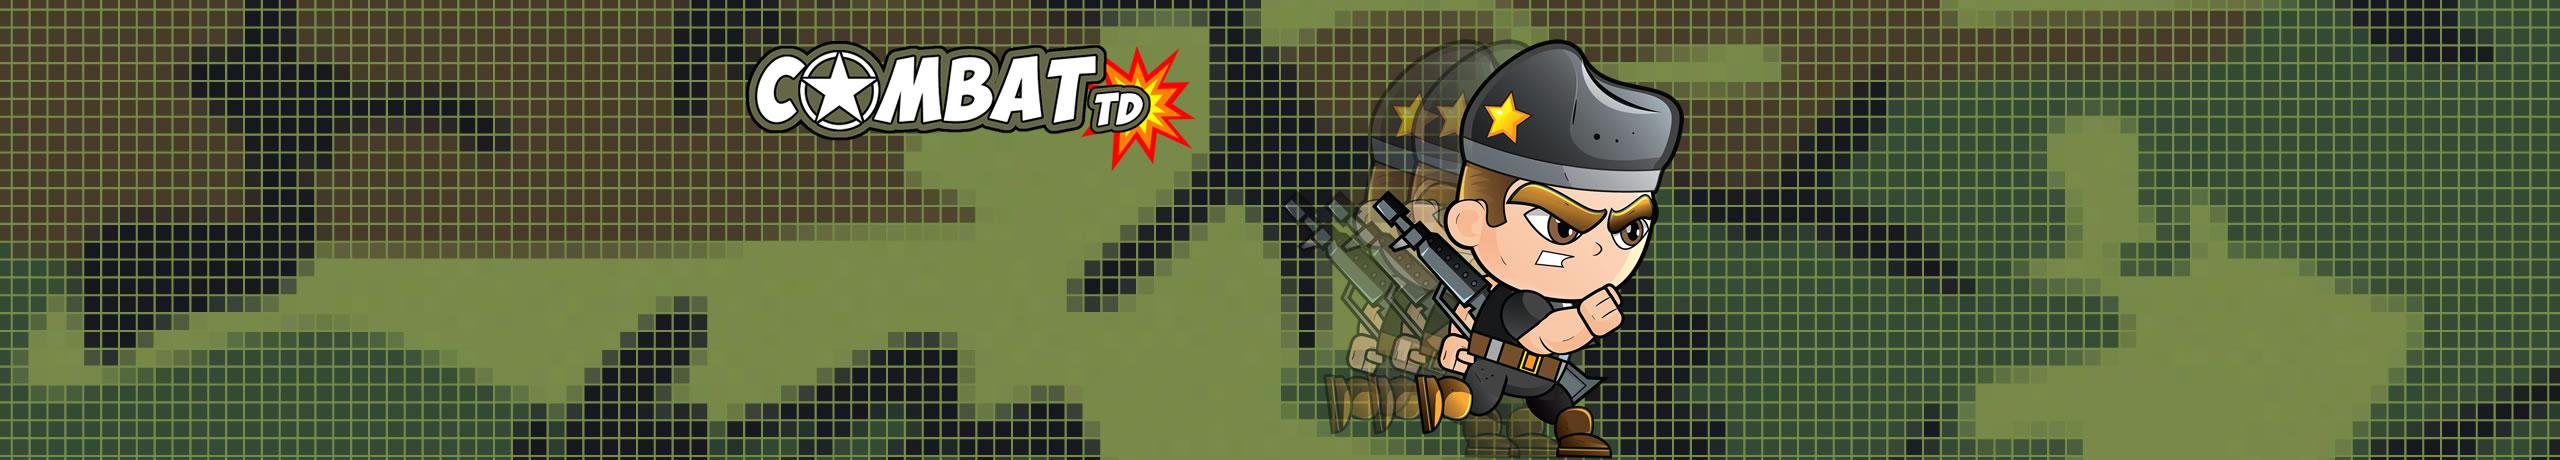 hdf_combat-td